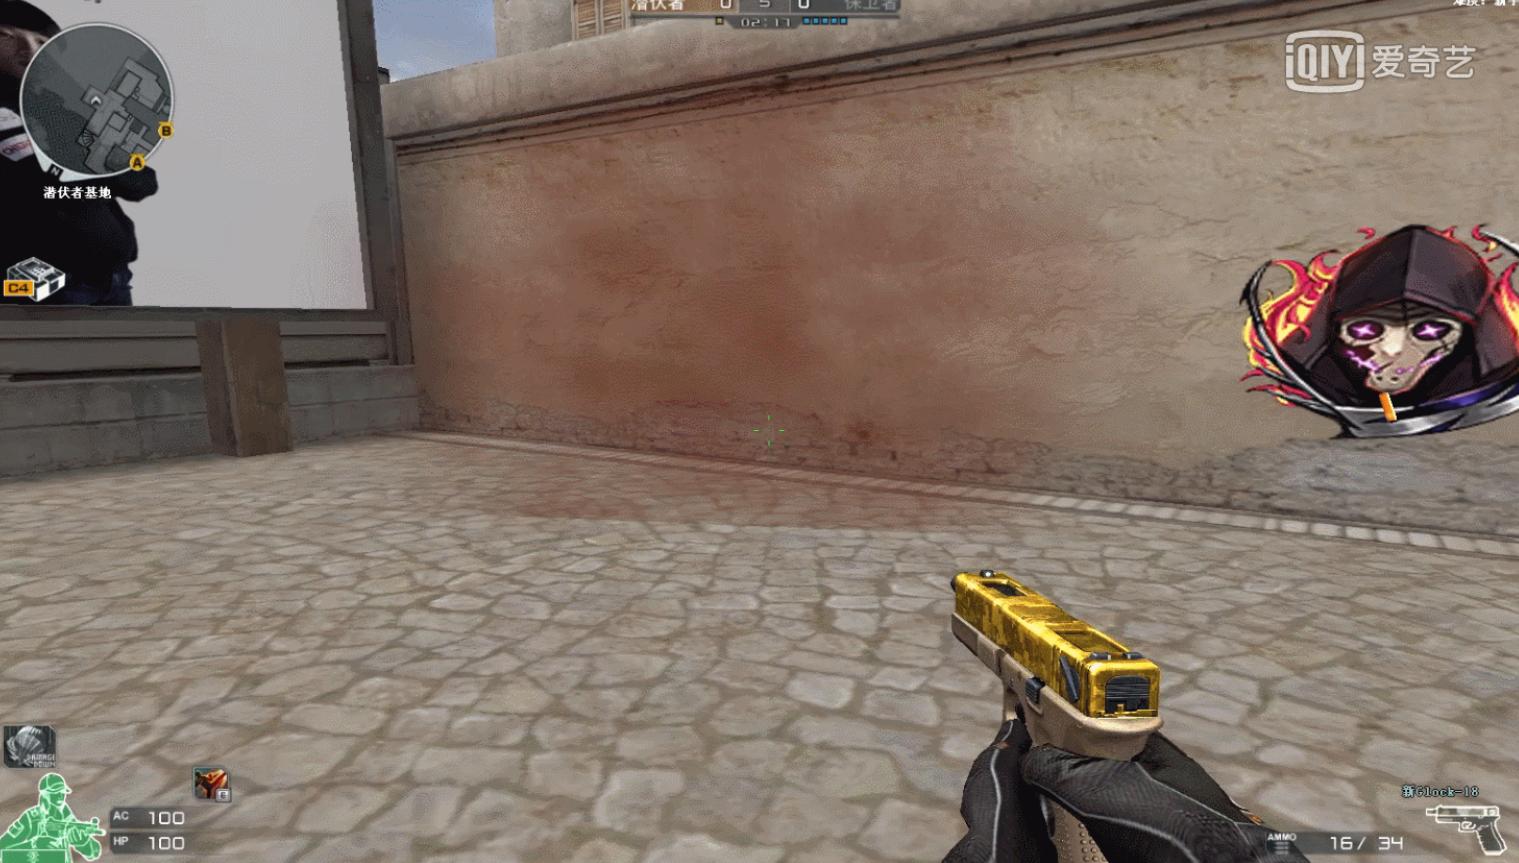 CF无视烟雾rez·替换上游戏即可V7.3免费版